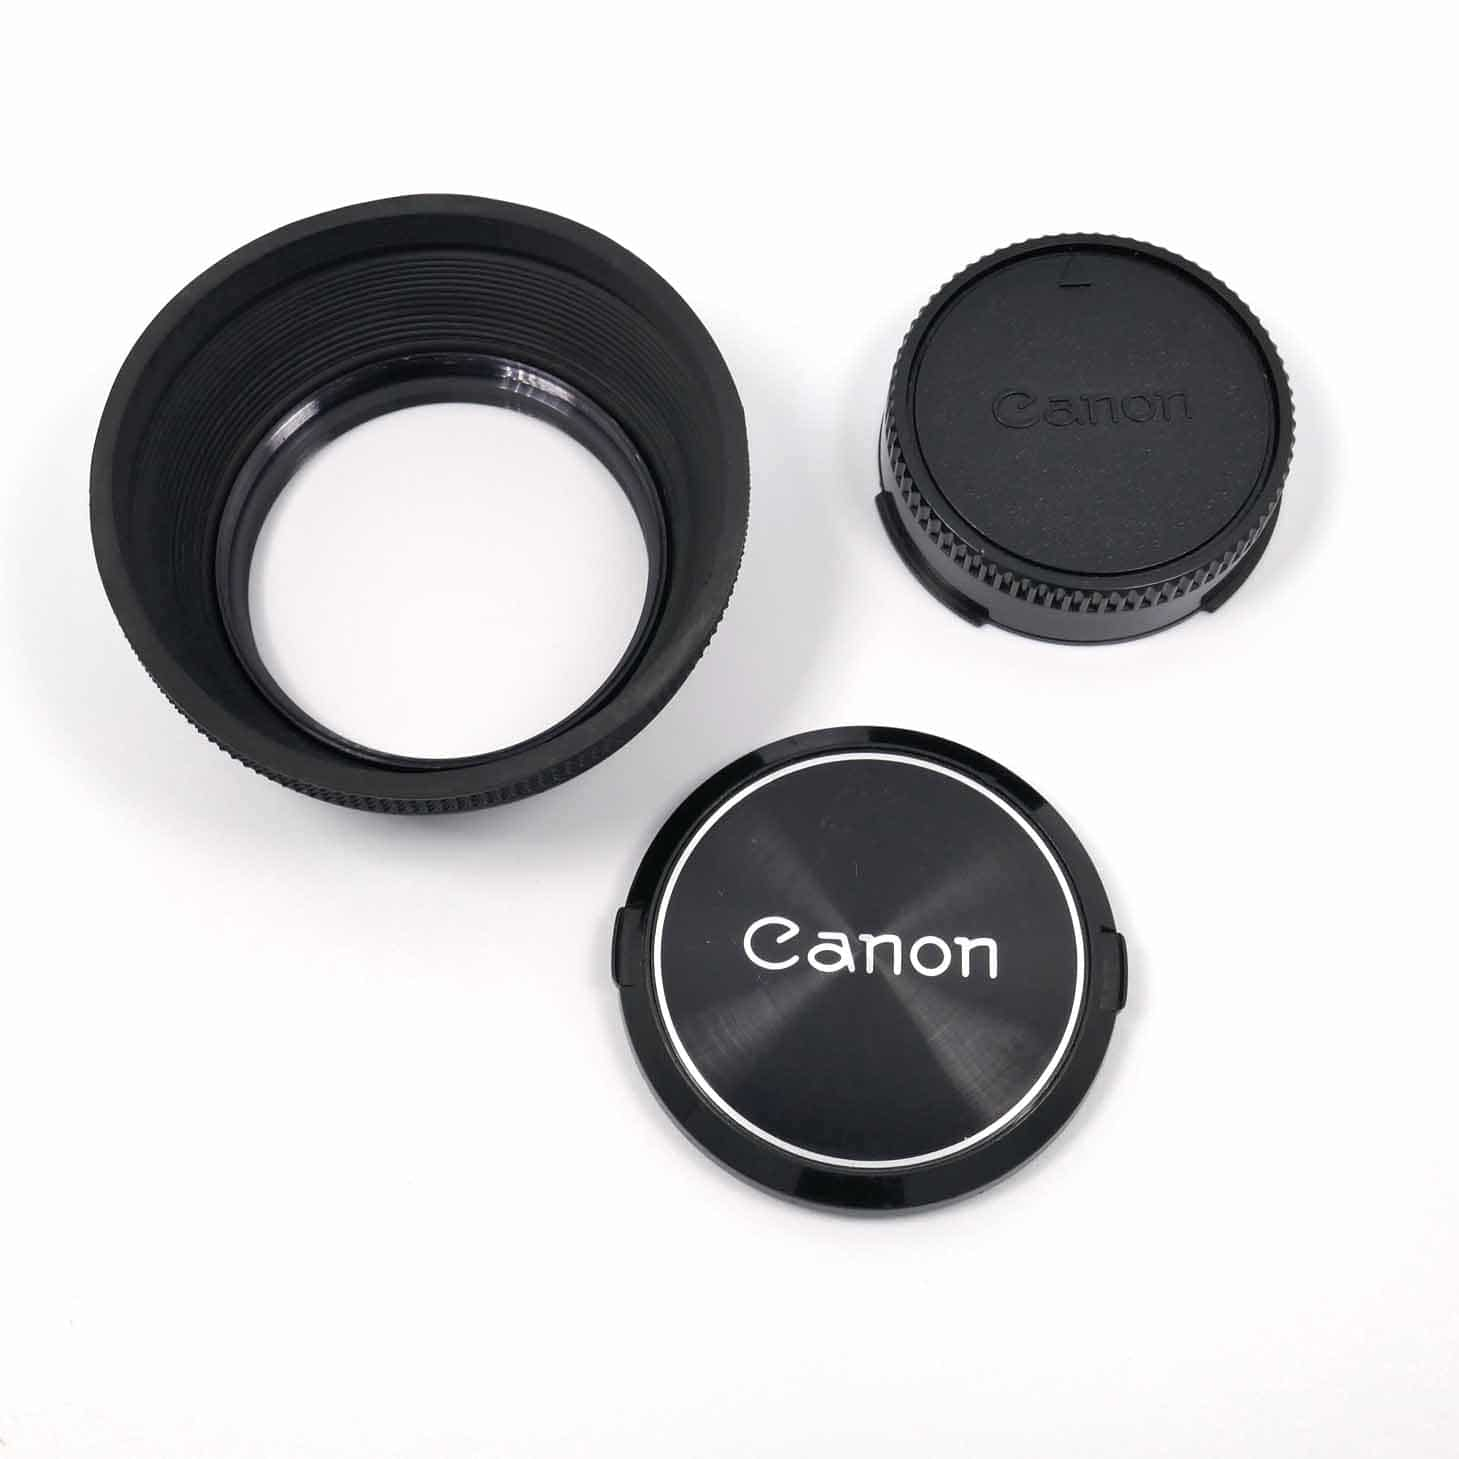 clean-cameras-Canon-FD-50mm-1.4-s.s.c-04